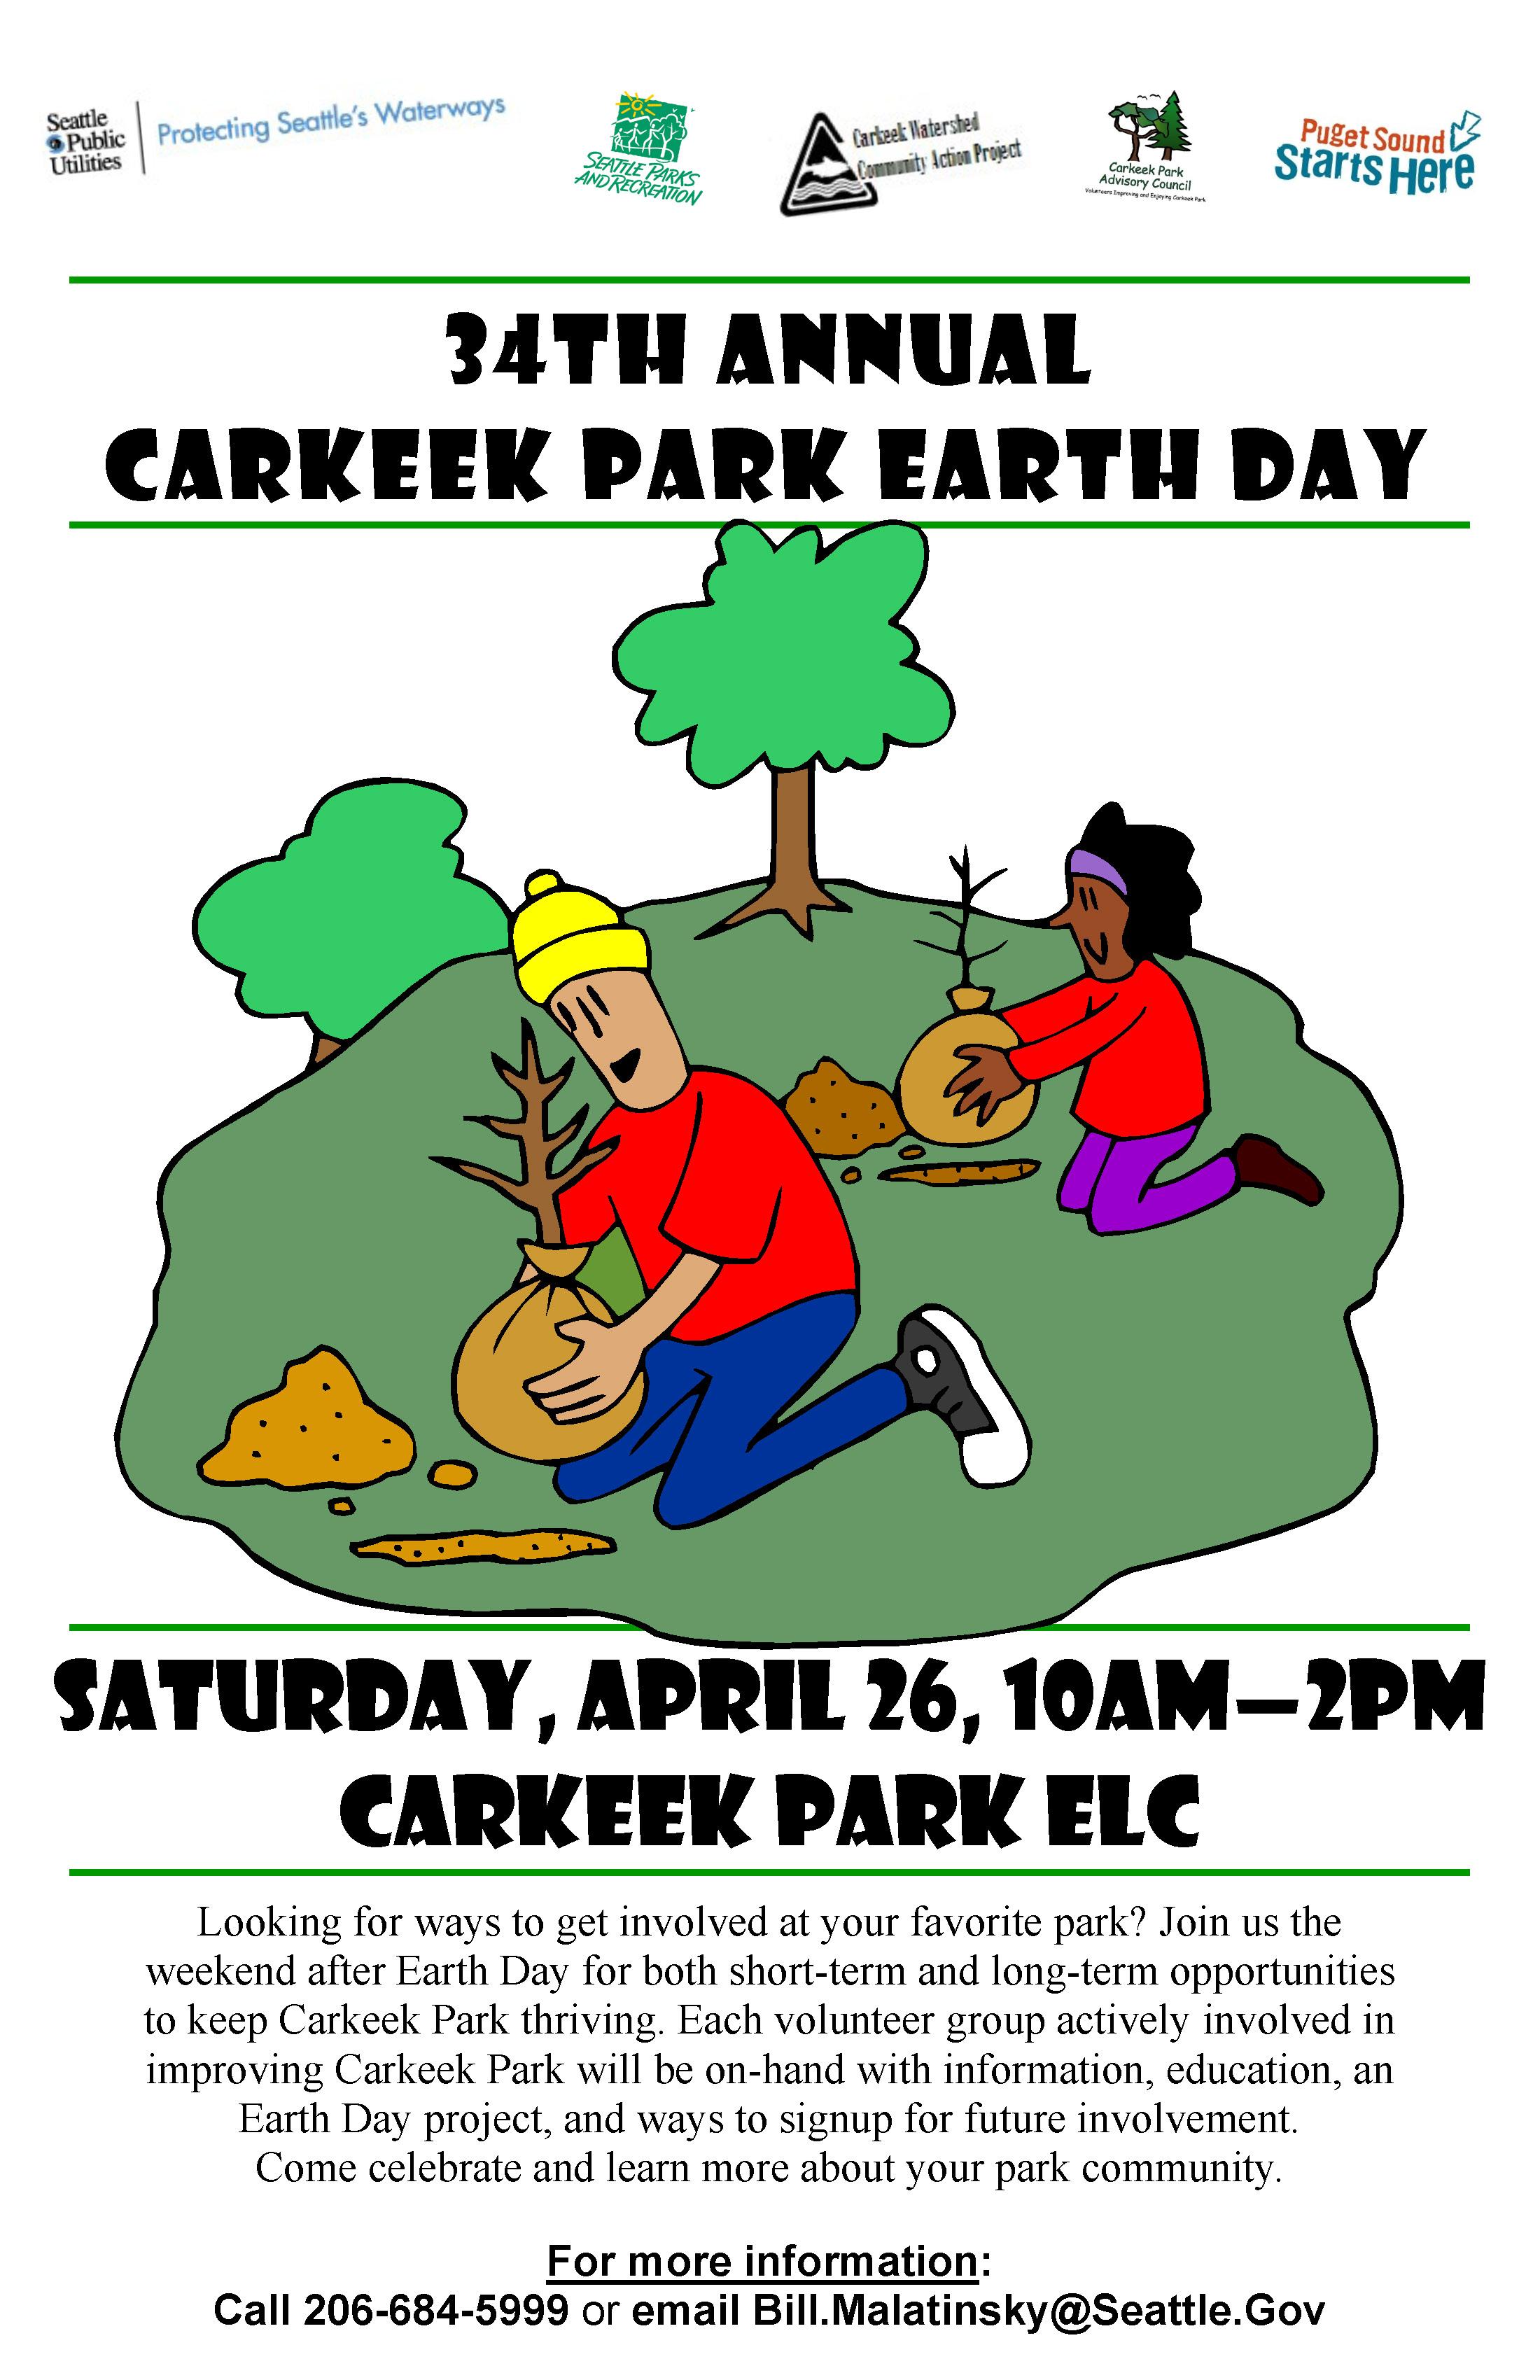 Carkeek Park Earth Day 2014 11x17 poster.jpg